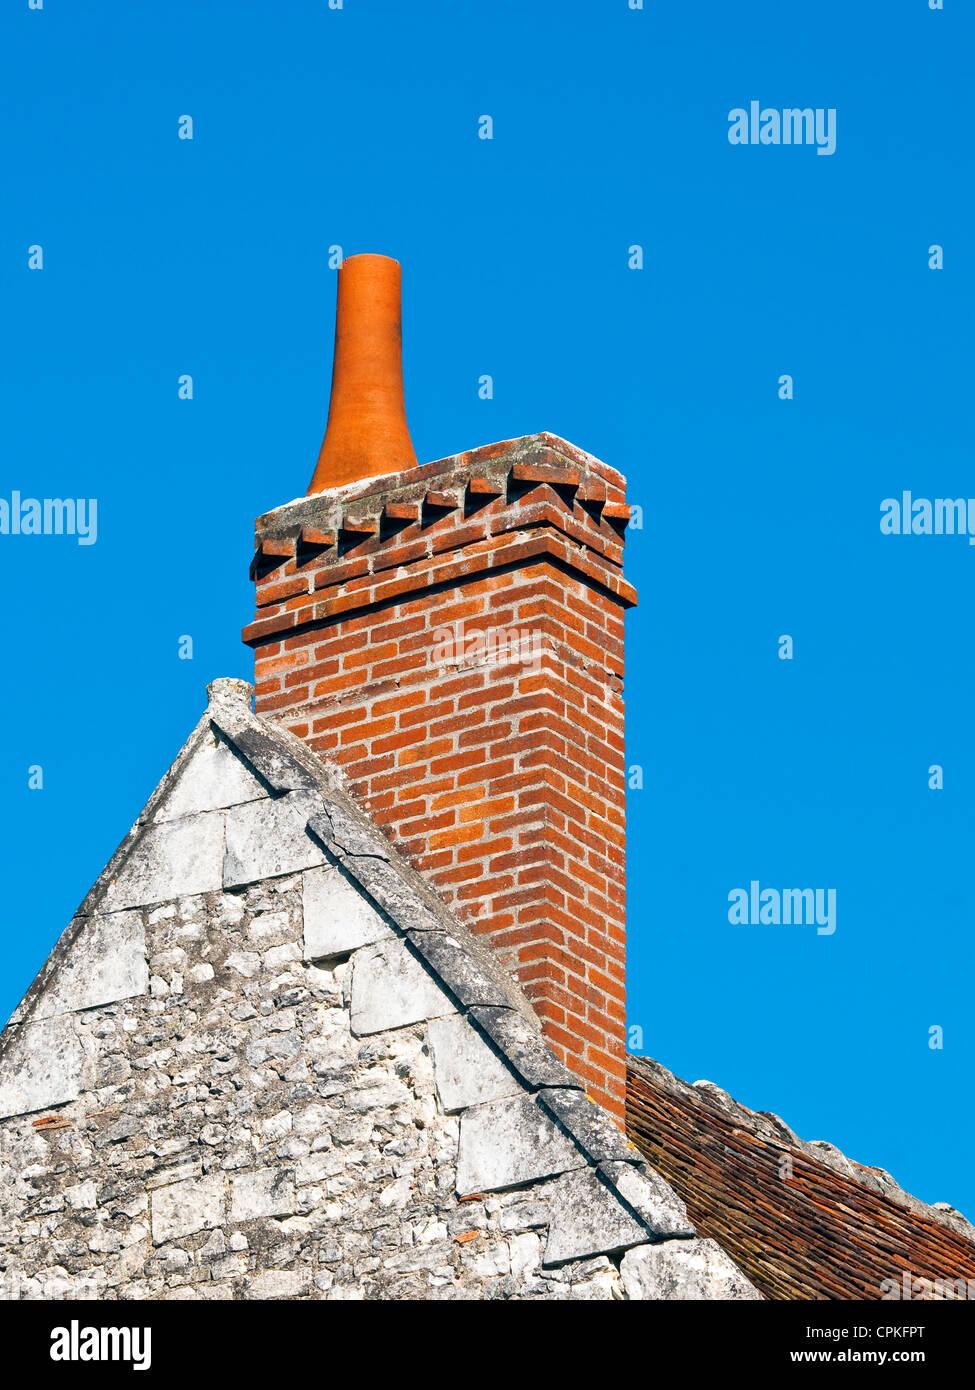 Brick Chimney Roof Tiles Stock Photos Amp Brick Chimney Roof